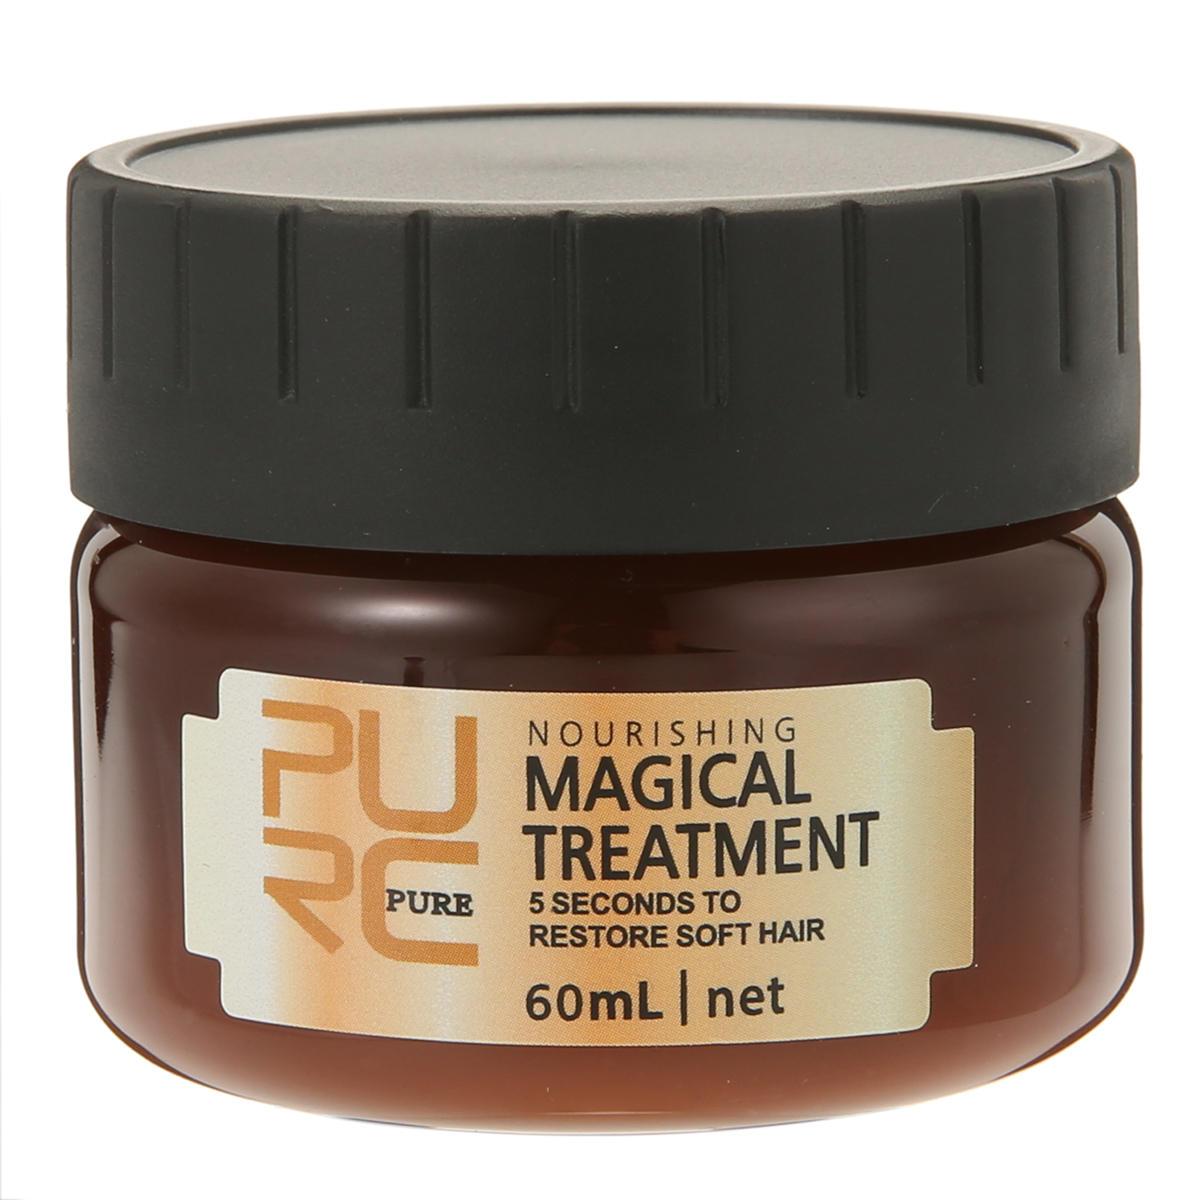 PURC 60ml Magical Treatment Mask Repairs Damage Restore Soft Hair Care